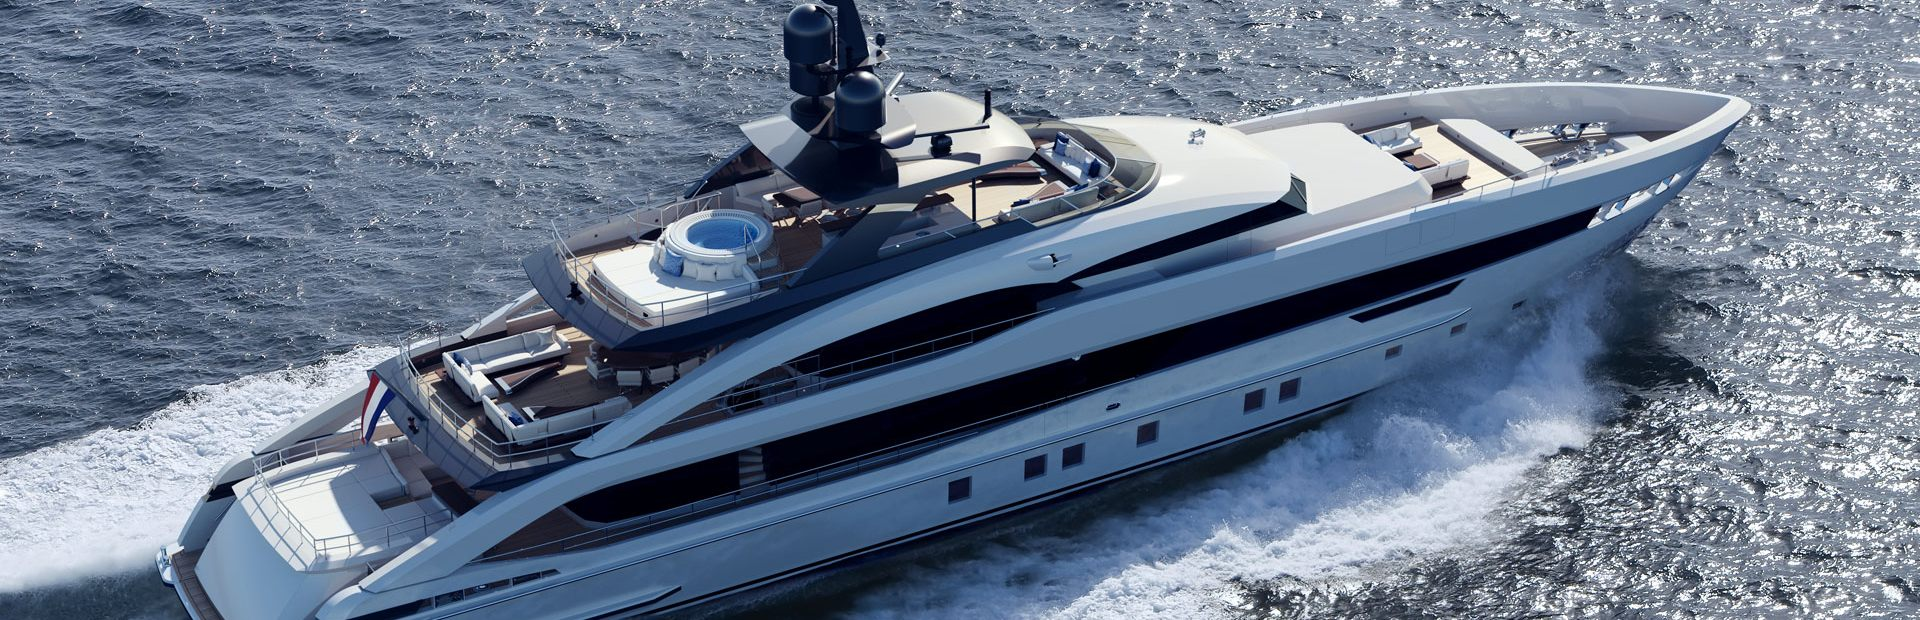 5000 Aluminium Yacht Charter